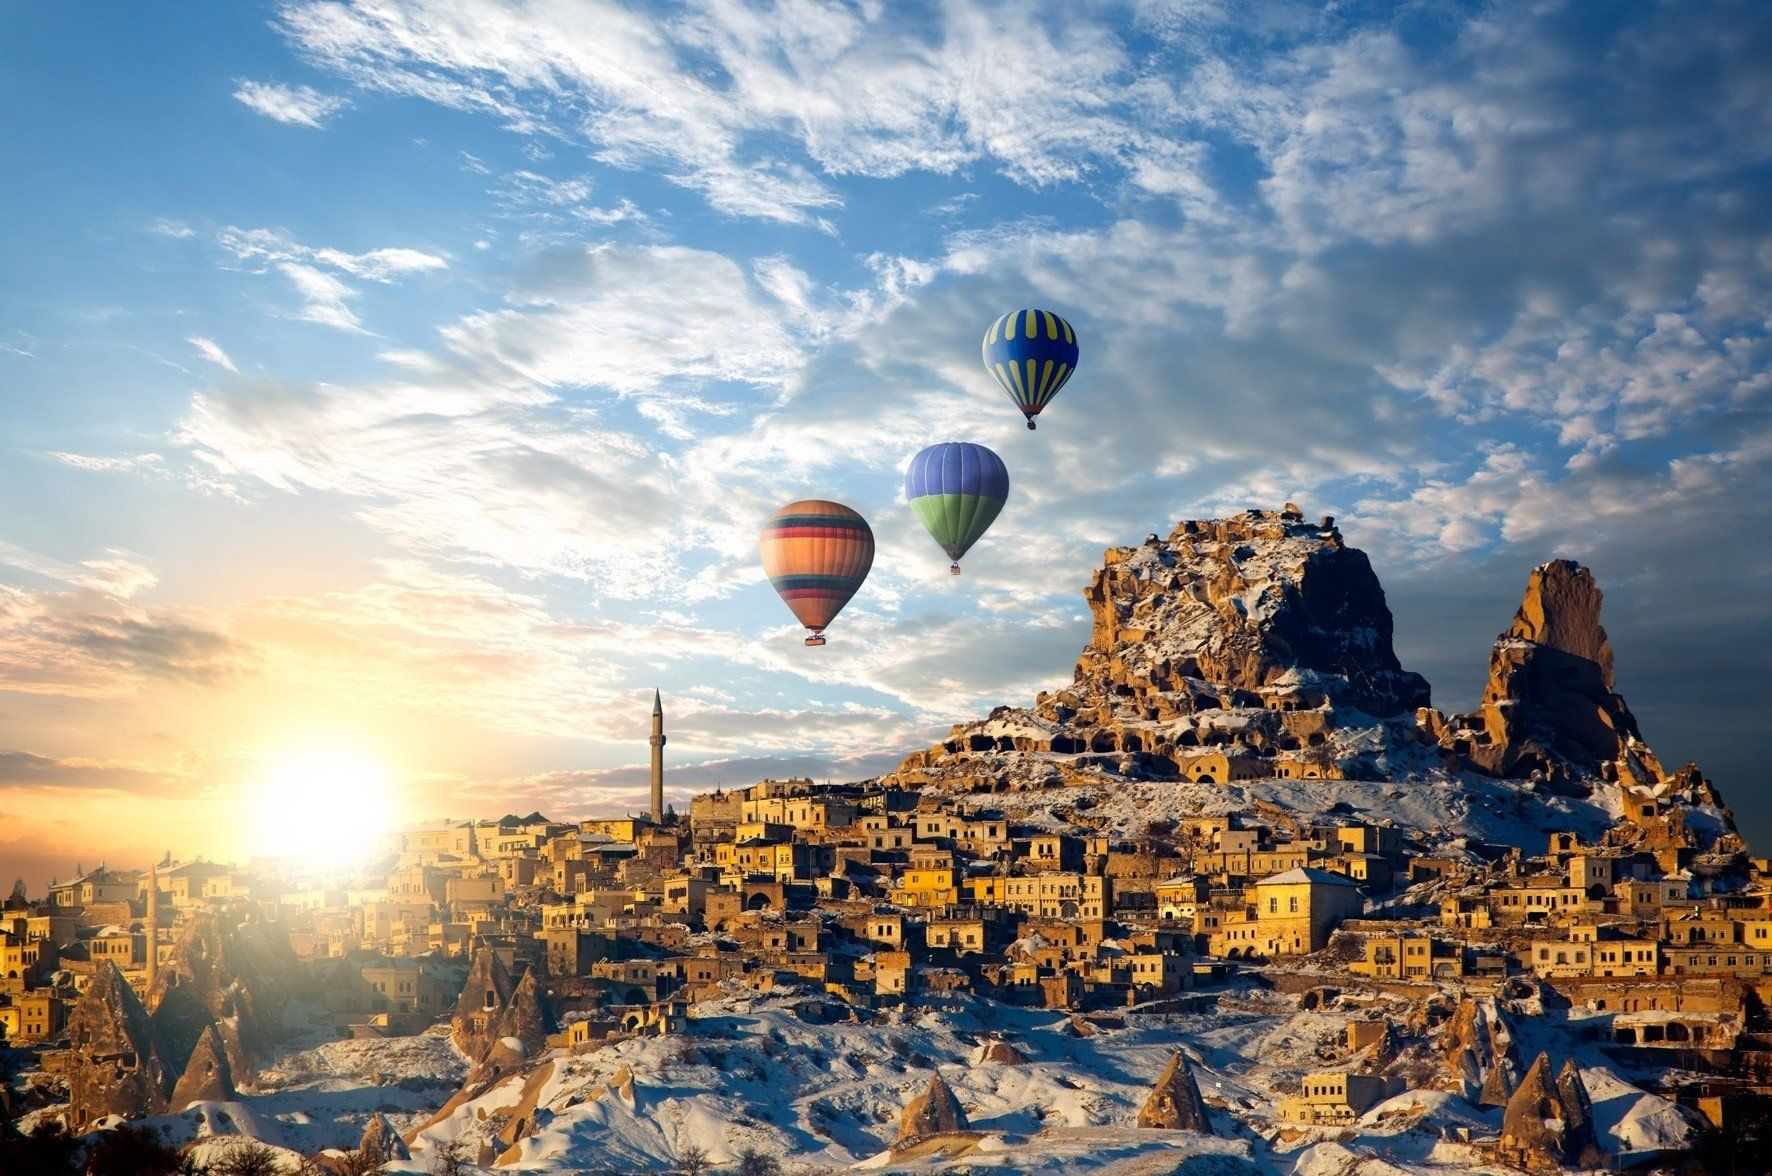 Cappadocia Wallpapers - Top Free Cappadocia Backgrounds - WallpaperAccess